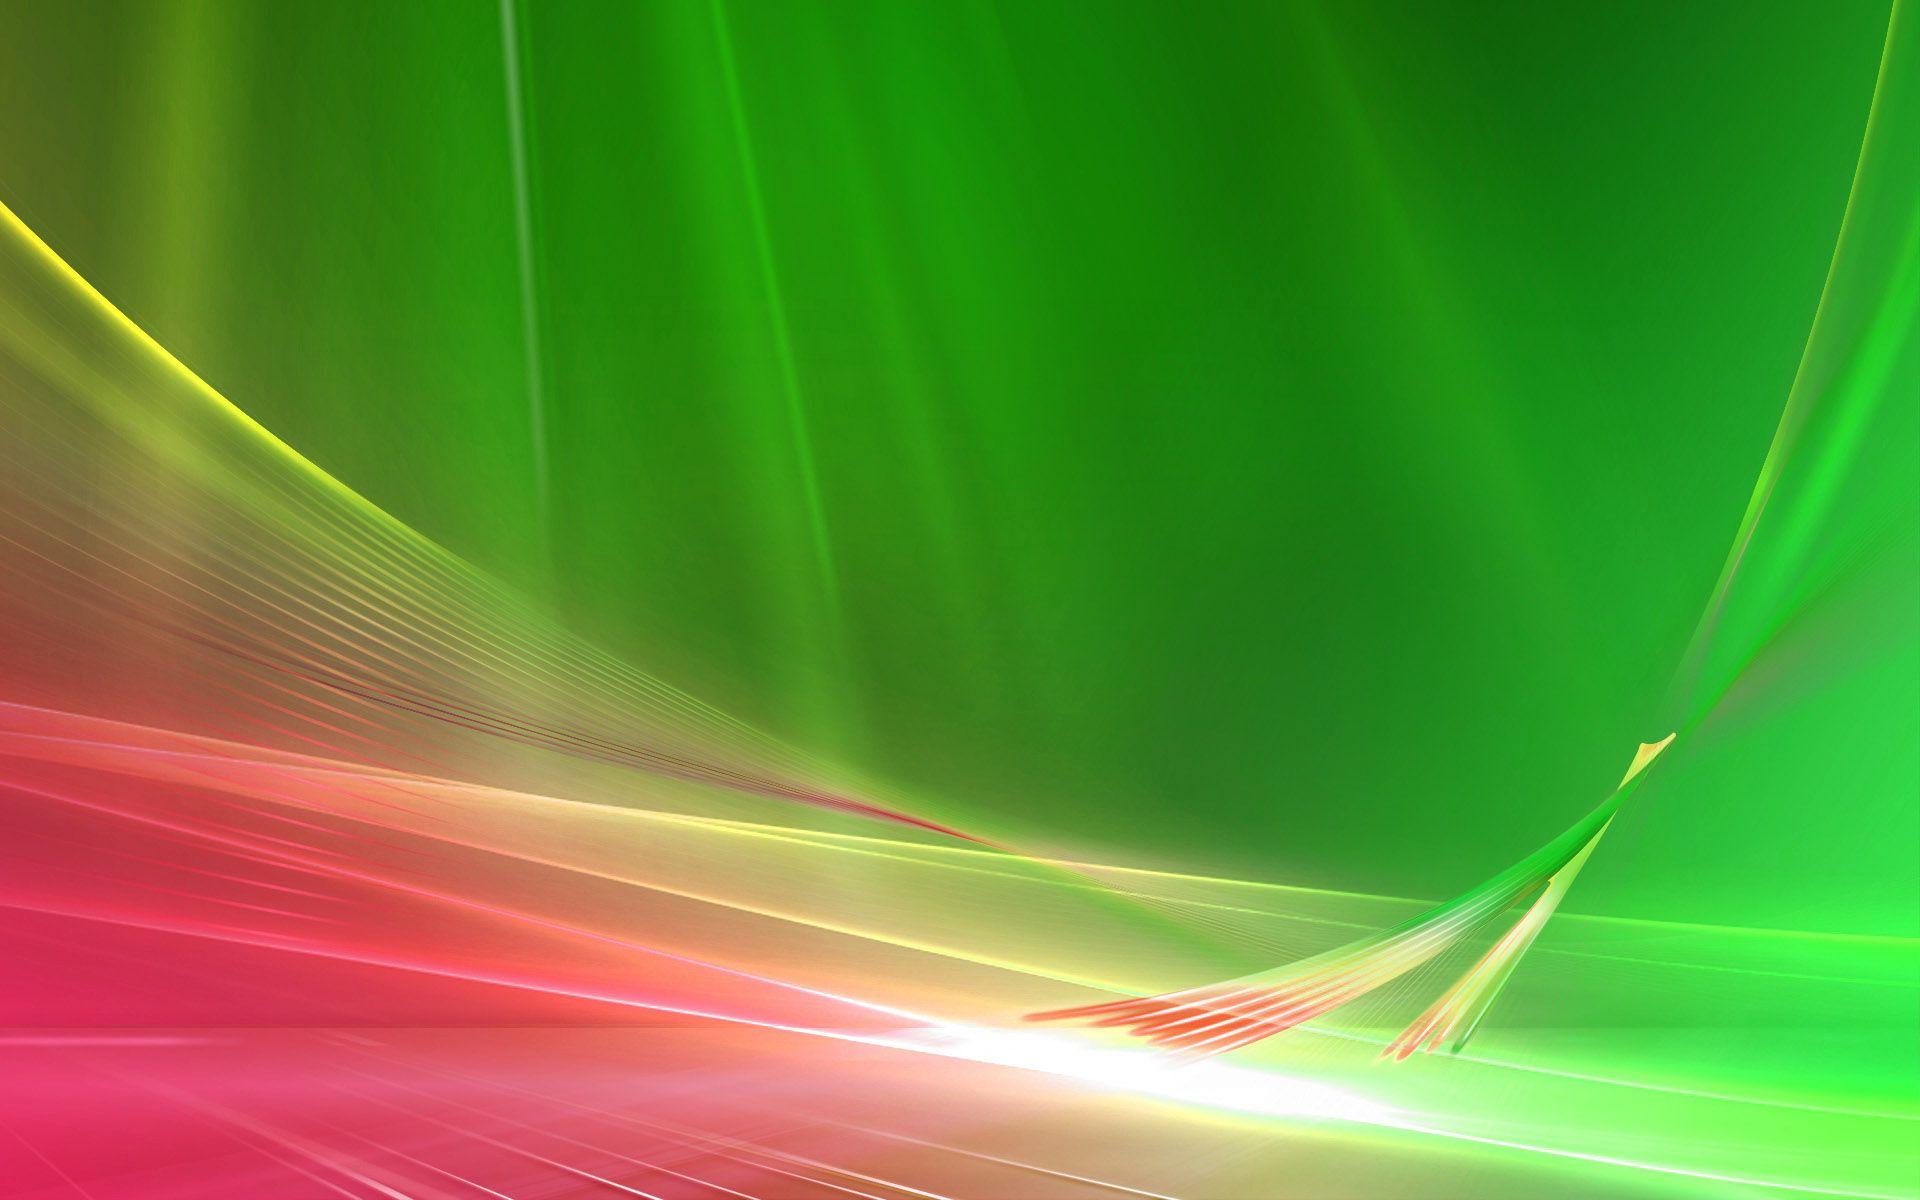 Ravishment Microsoft Windows Vista Operating System HD Wallpapers 1920x1200